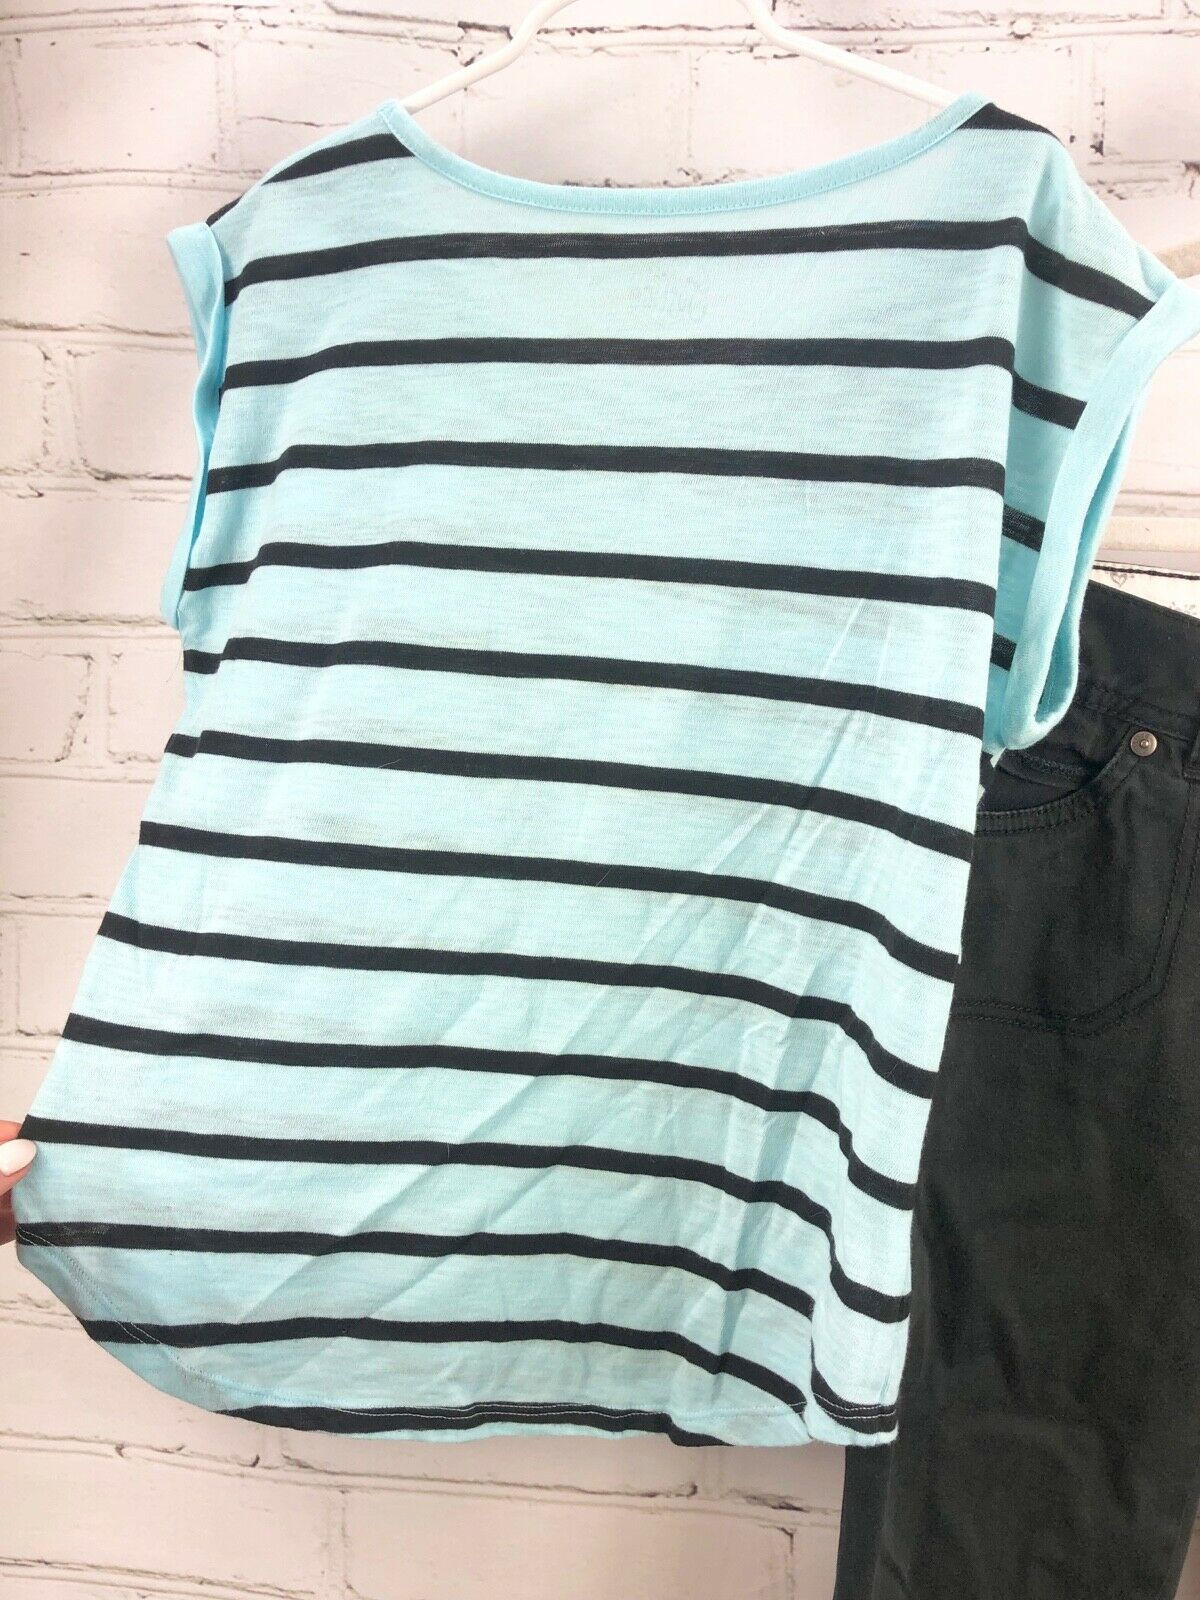 JUSTICE Beaded Stripe Top + Black Capri Pants Girls Size 12 Outfit Set image 5